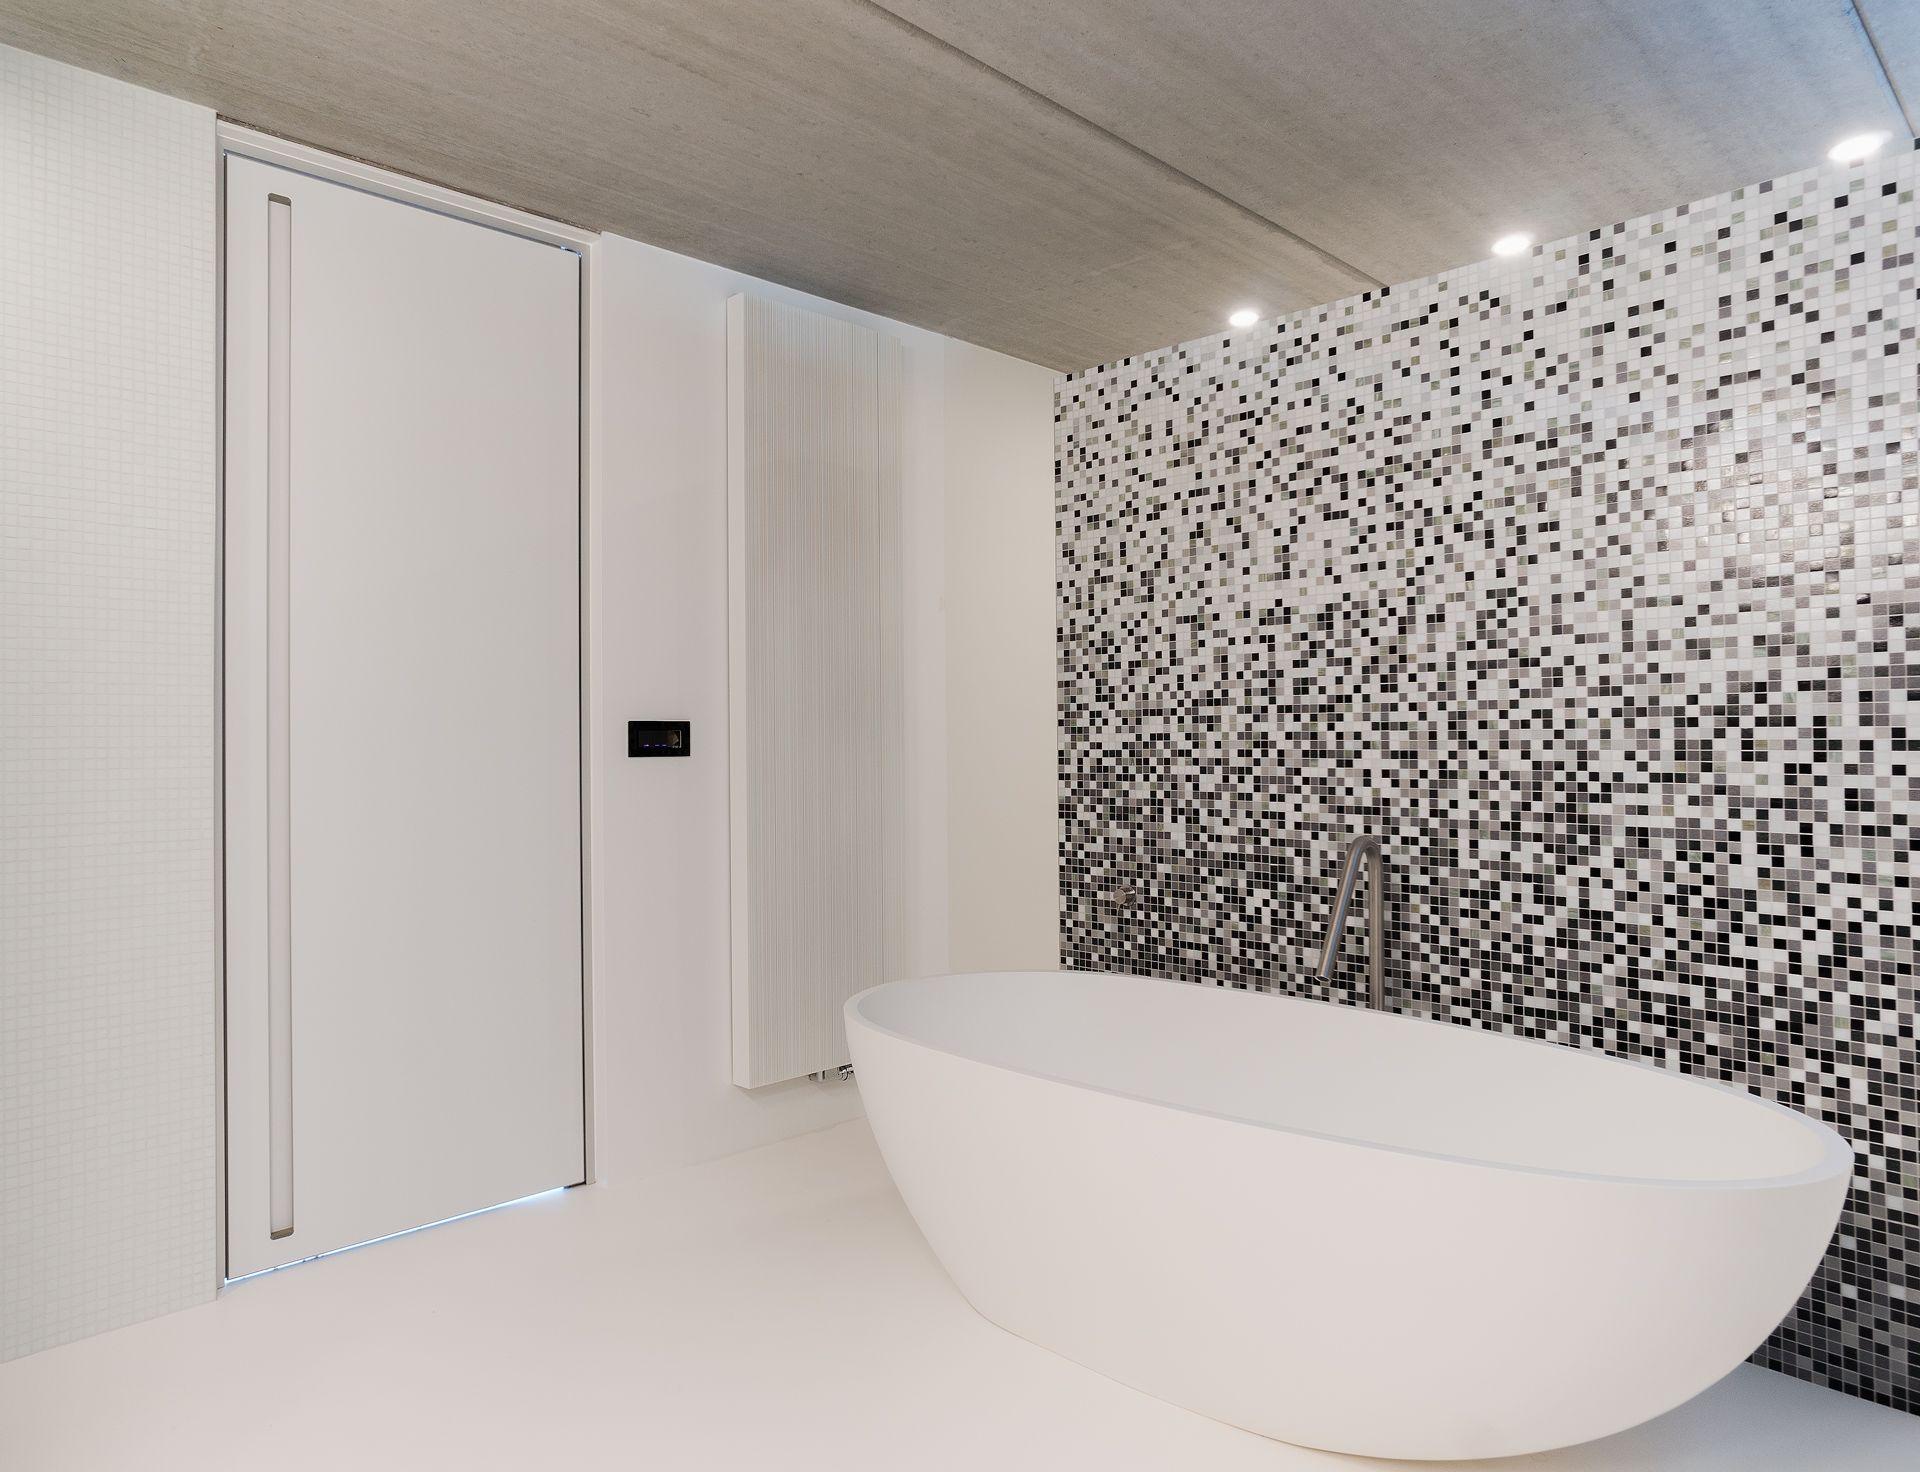 Moderne badkamer met wit bad, witte gietvloer en zwart/wit mozaïek ...